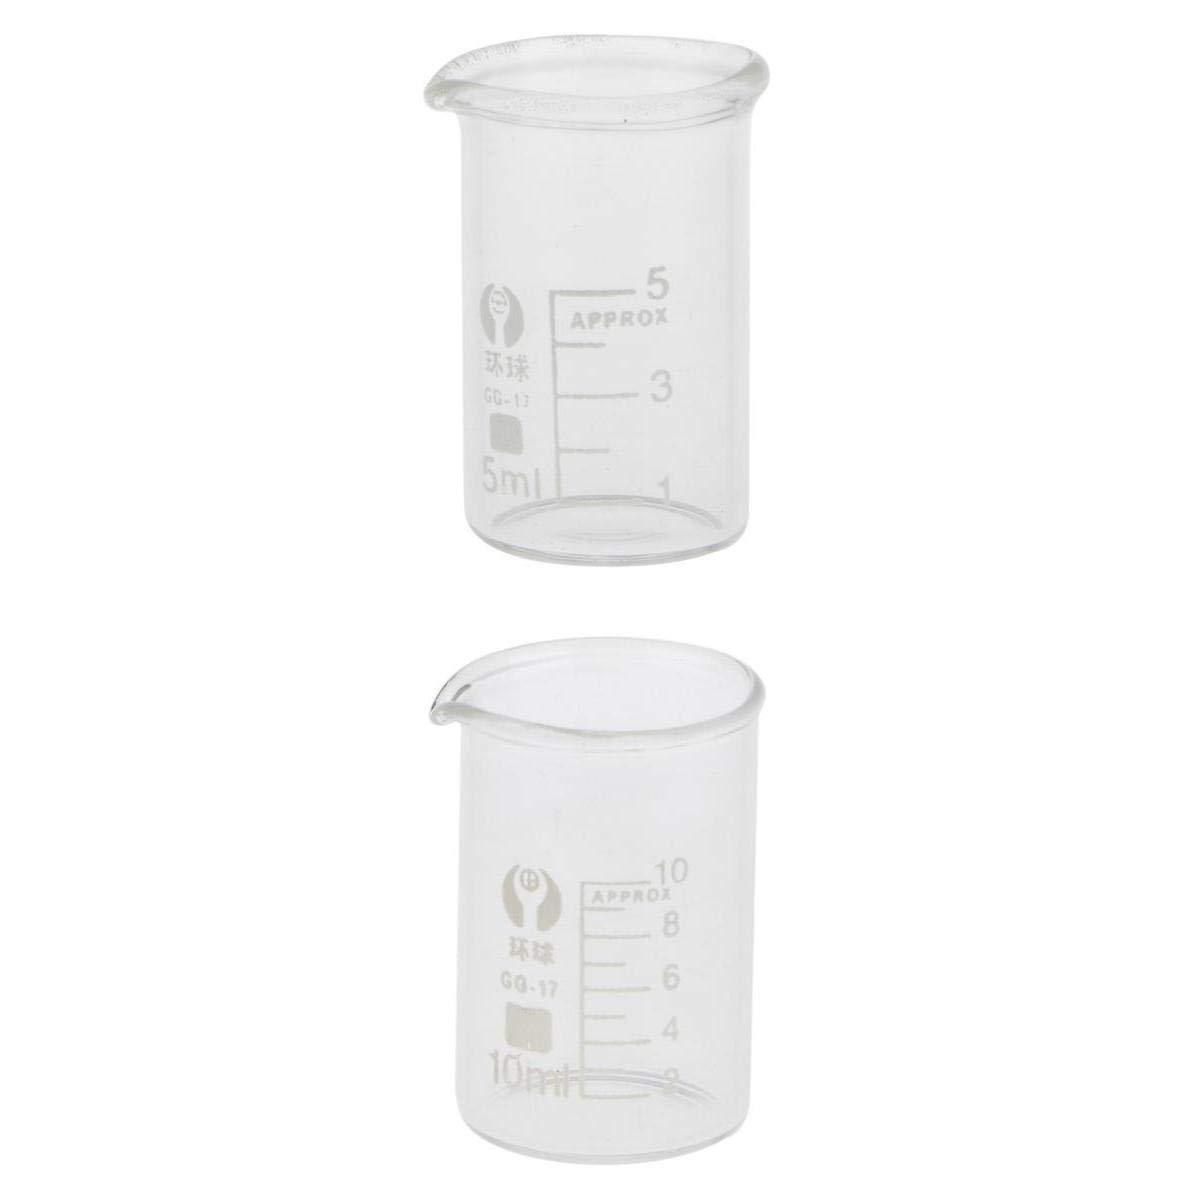 Baoblaze Glass Cylinder Beaker Conical Flask Graduated Glass Measuring NEW 5mL + 10mL